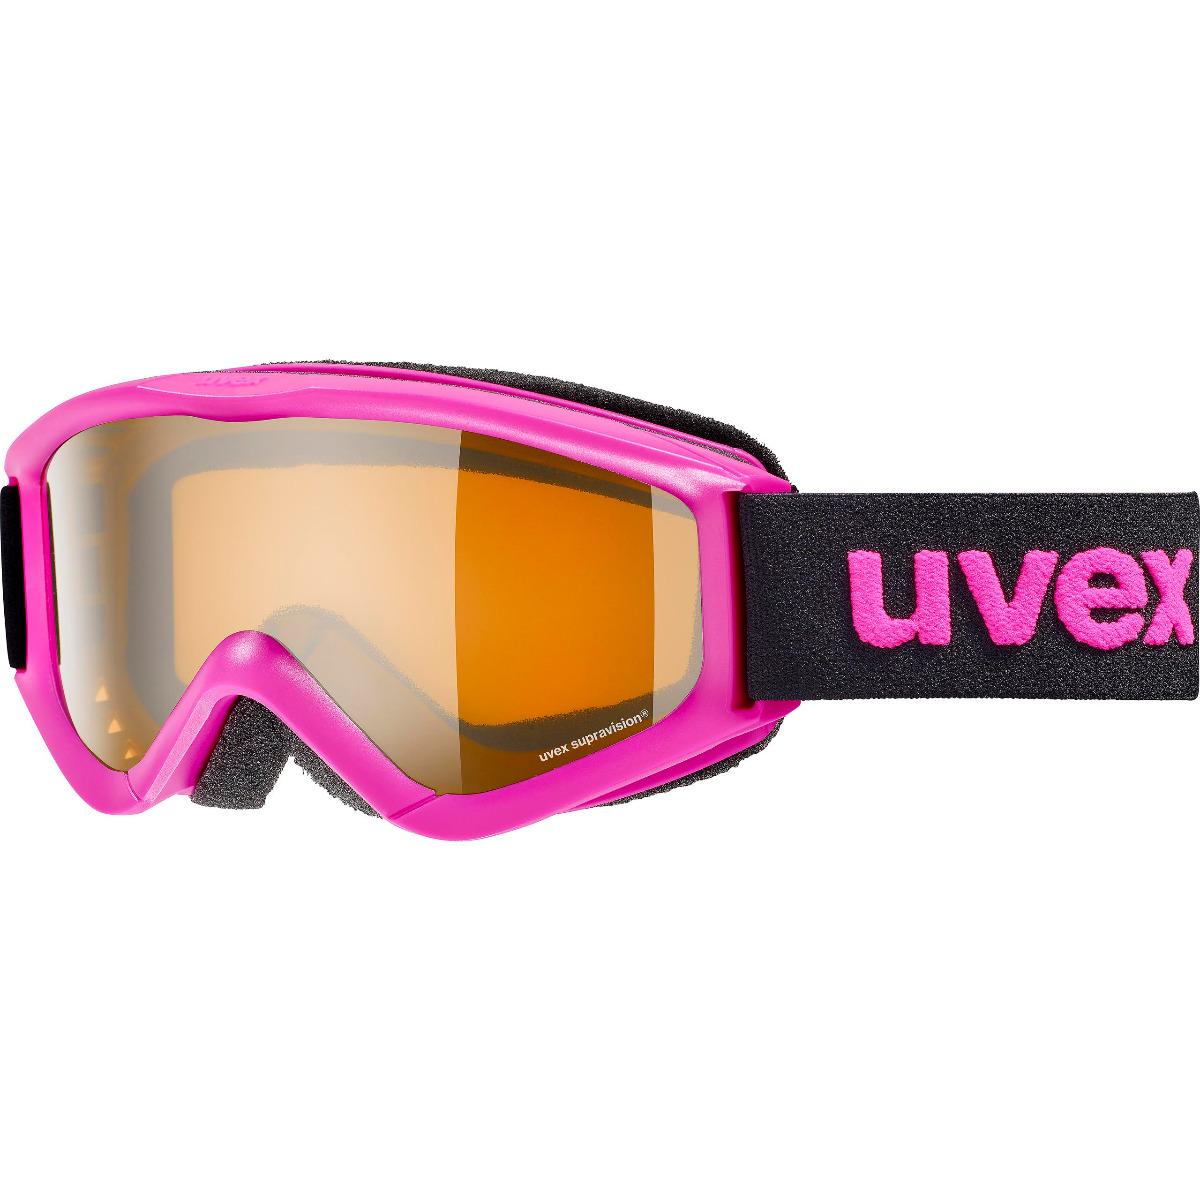 Produktbild UVEX Speedy pro